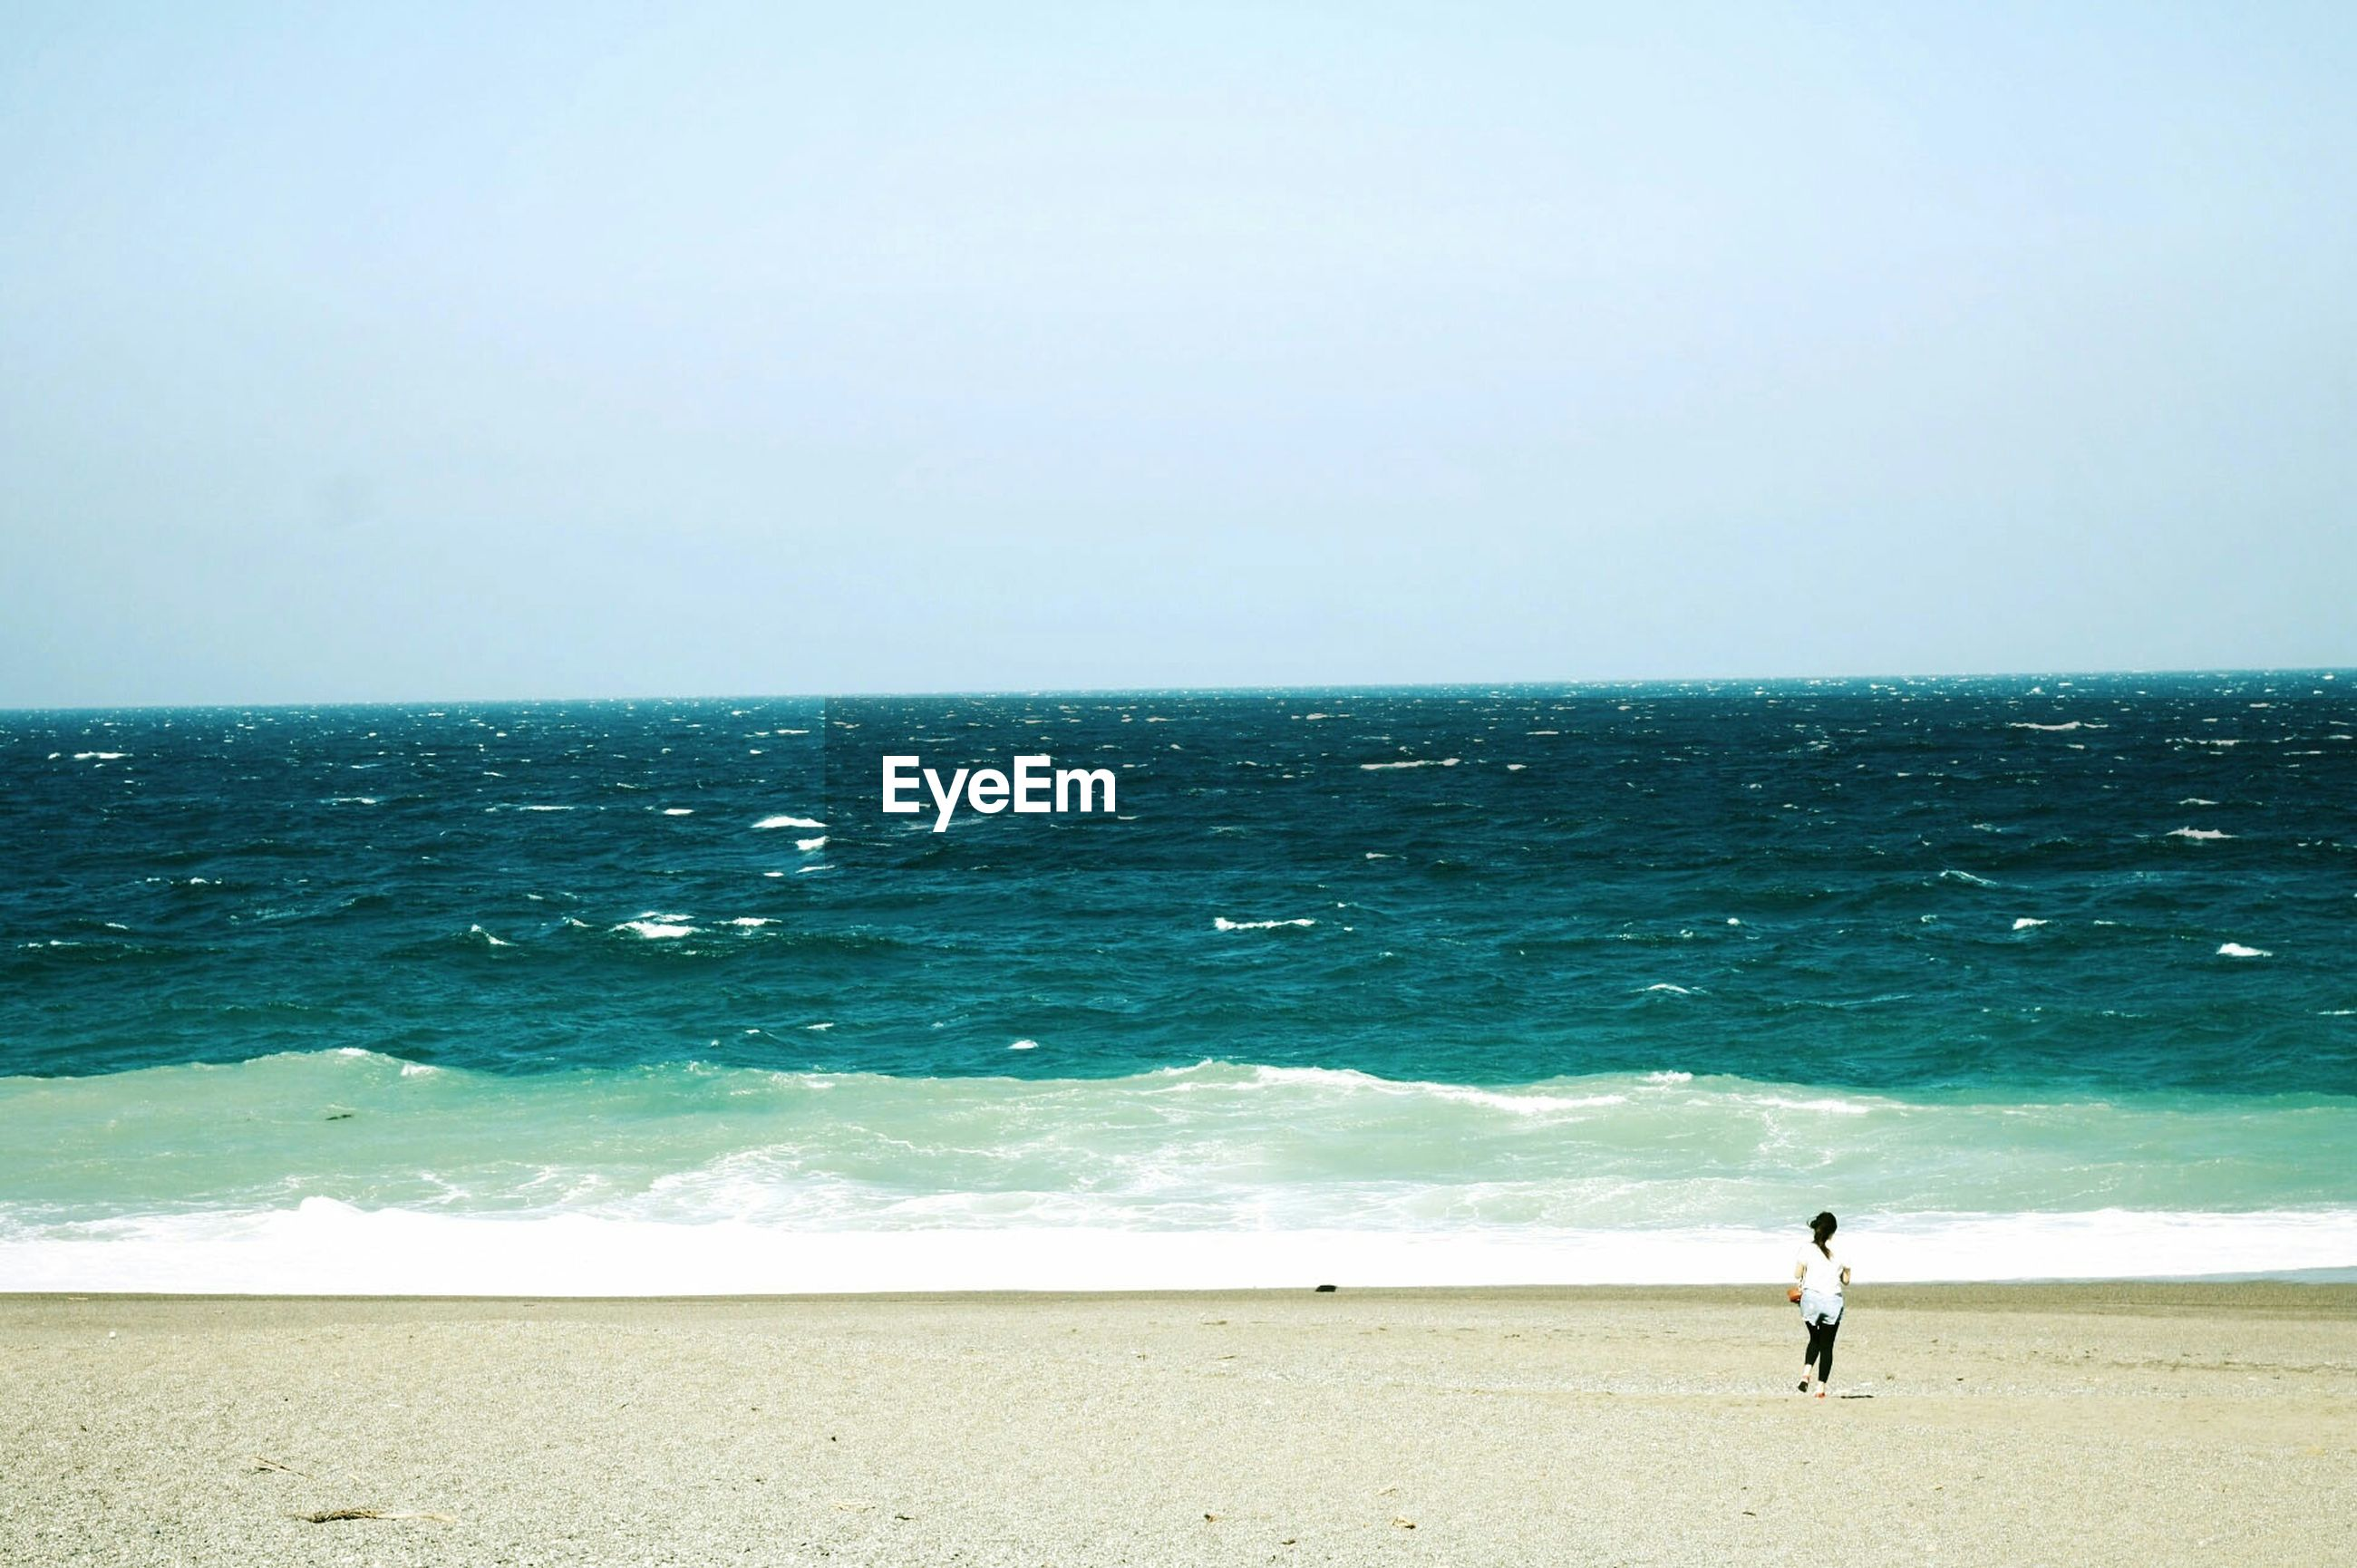 Woman standing on empty beach